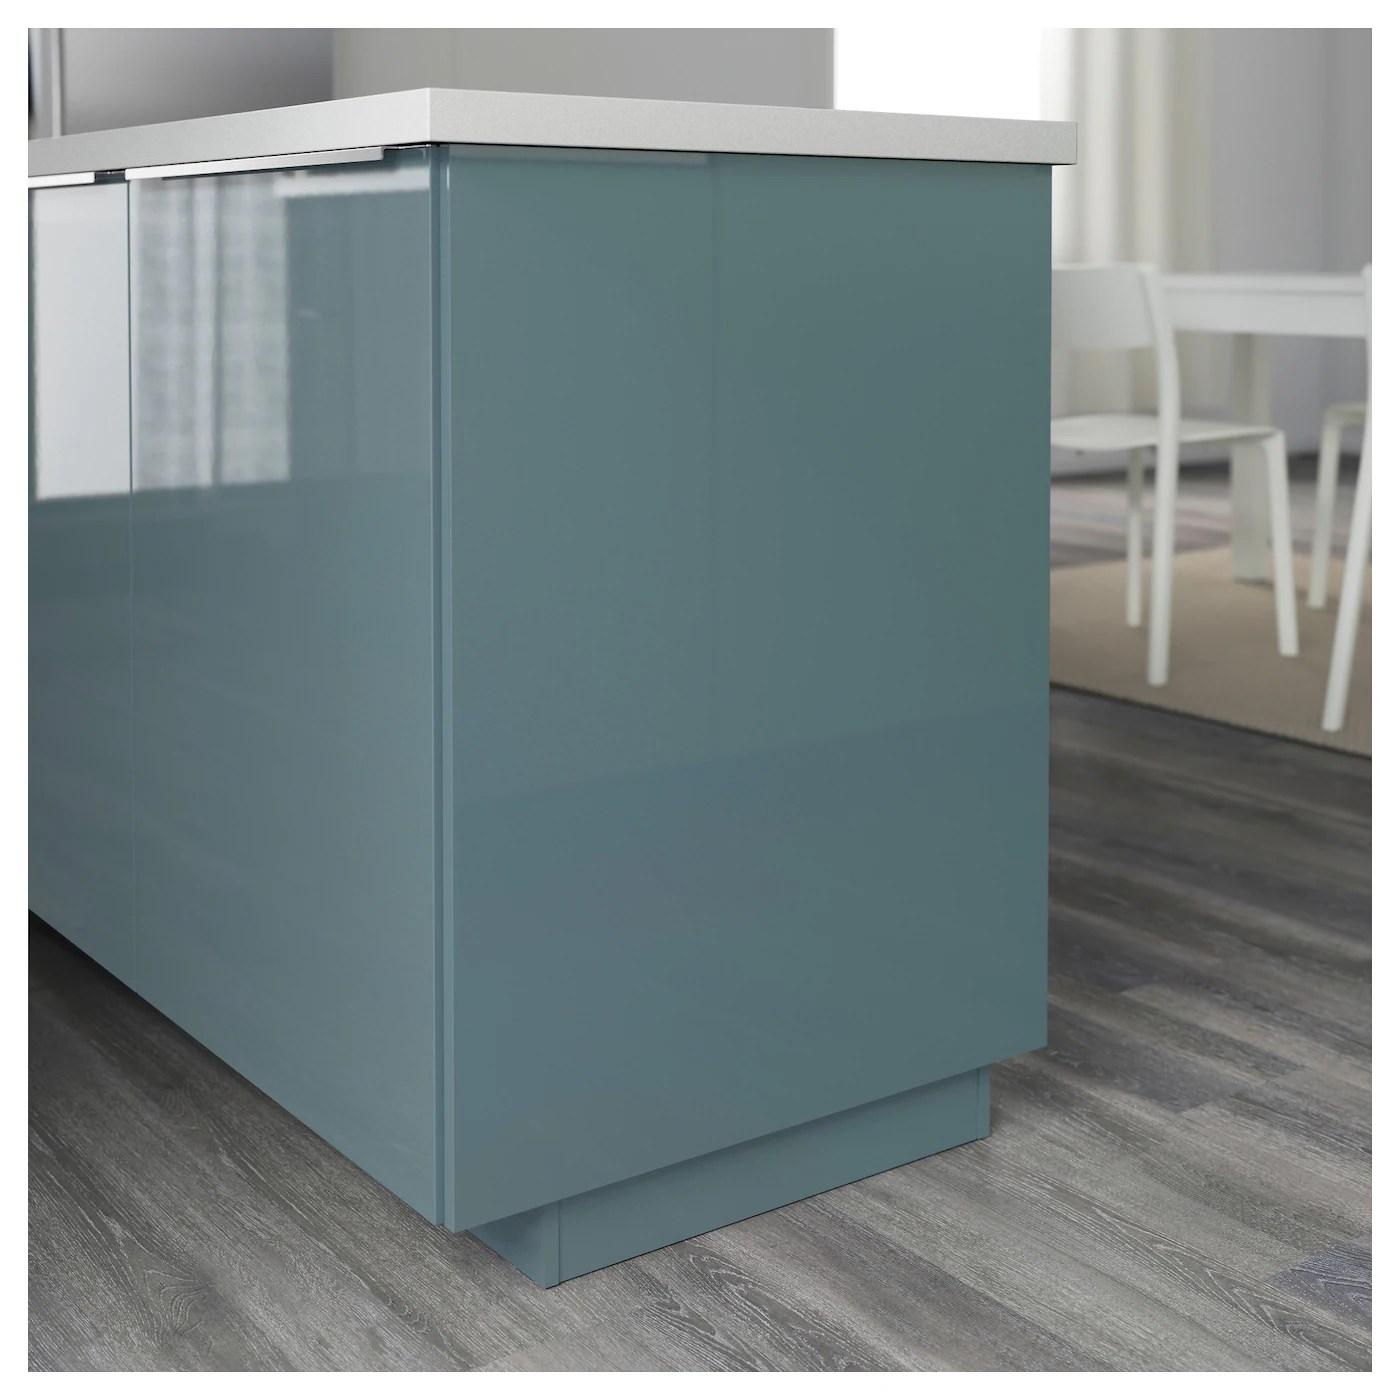 KALLARP Cover Panel High Gloss Grey Turquoise 39 X 86 Cm